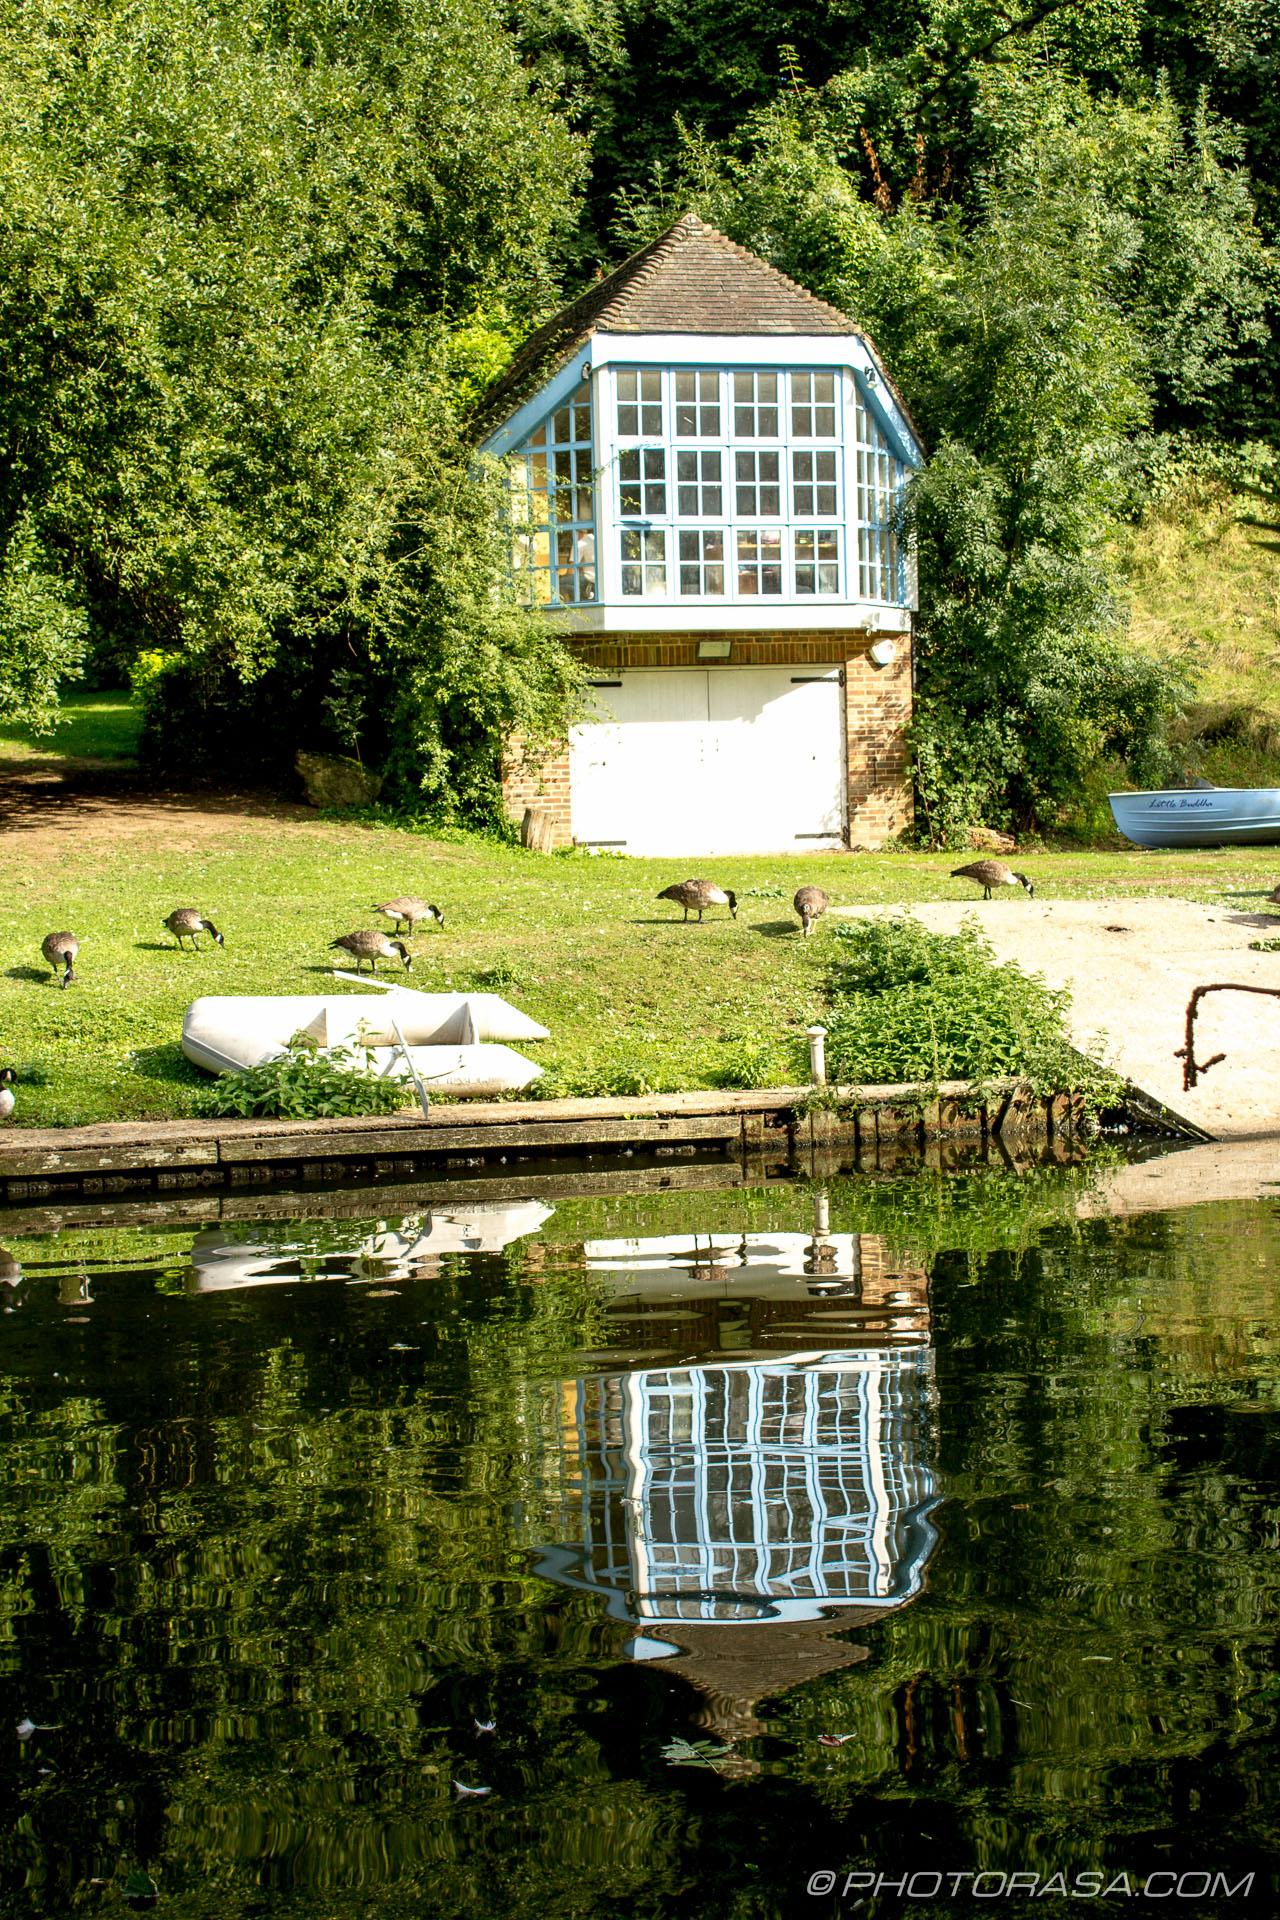 http://photorasa.com/maidstone/boat-house-reflection/